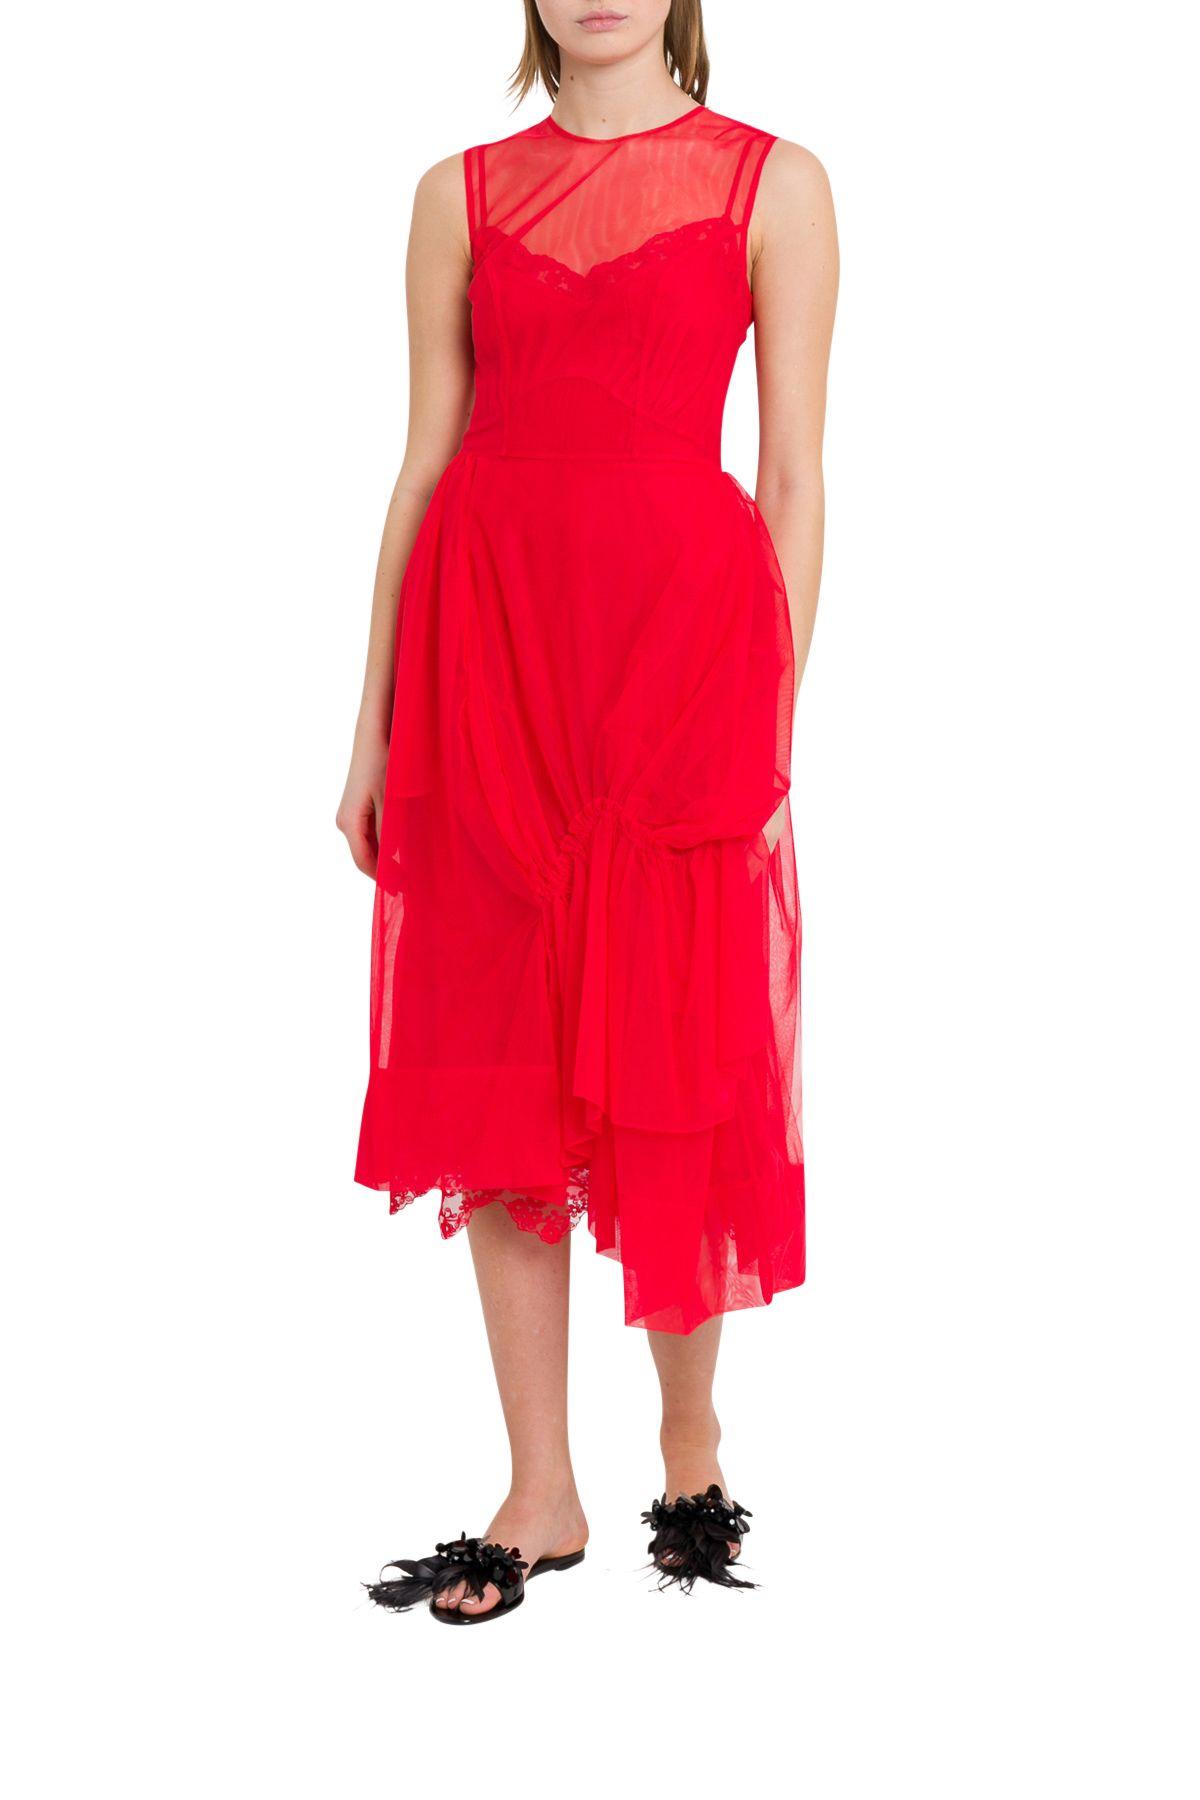 Simone Rocha Dresses GATHERED TULLE DRESS